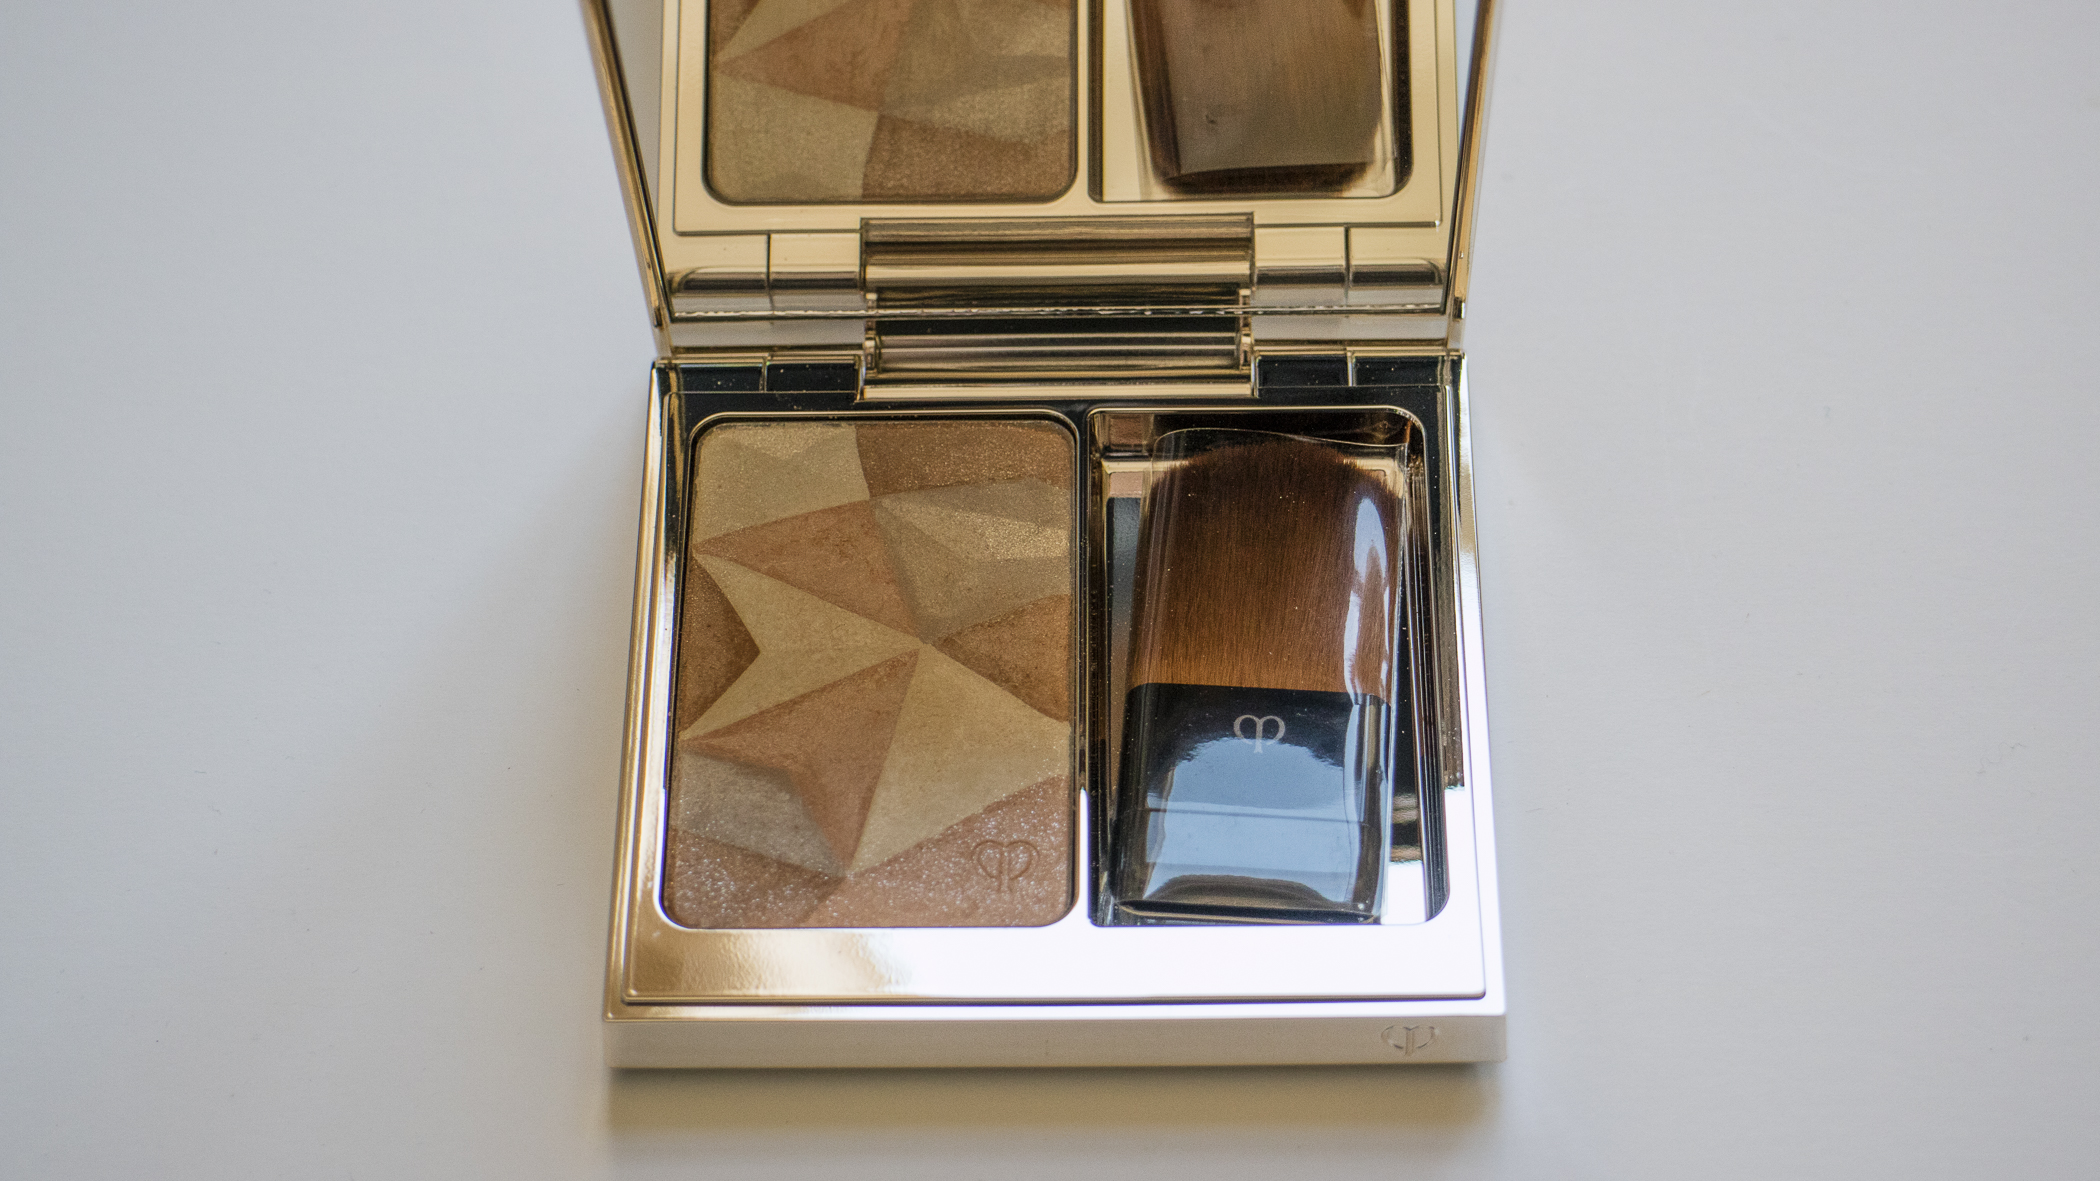 Cle de Peau's Luminizing Face Enhancer in 16